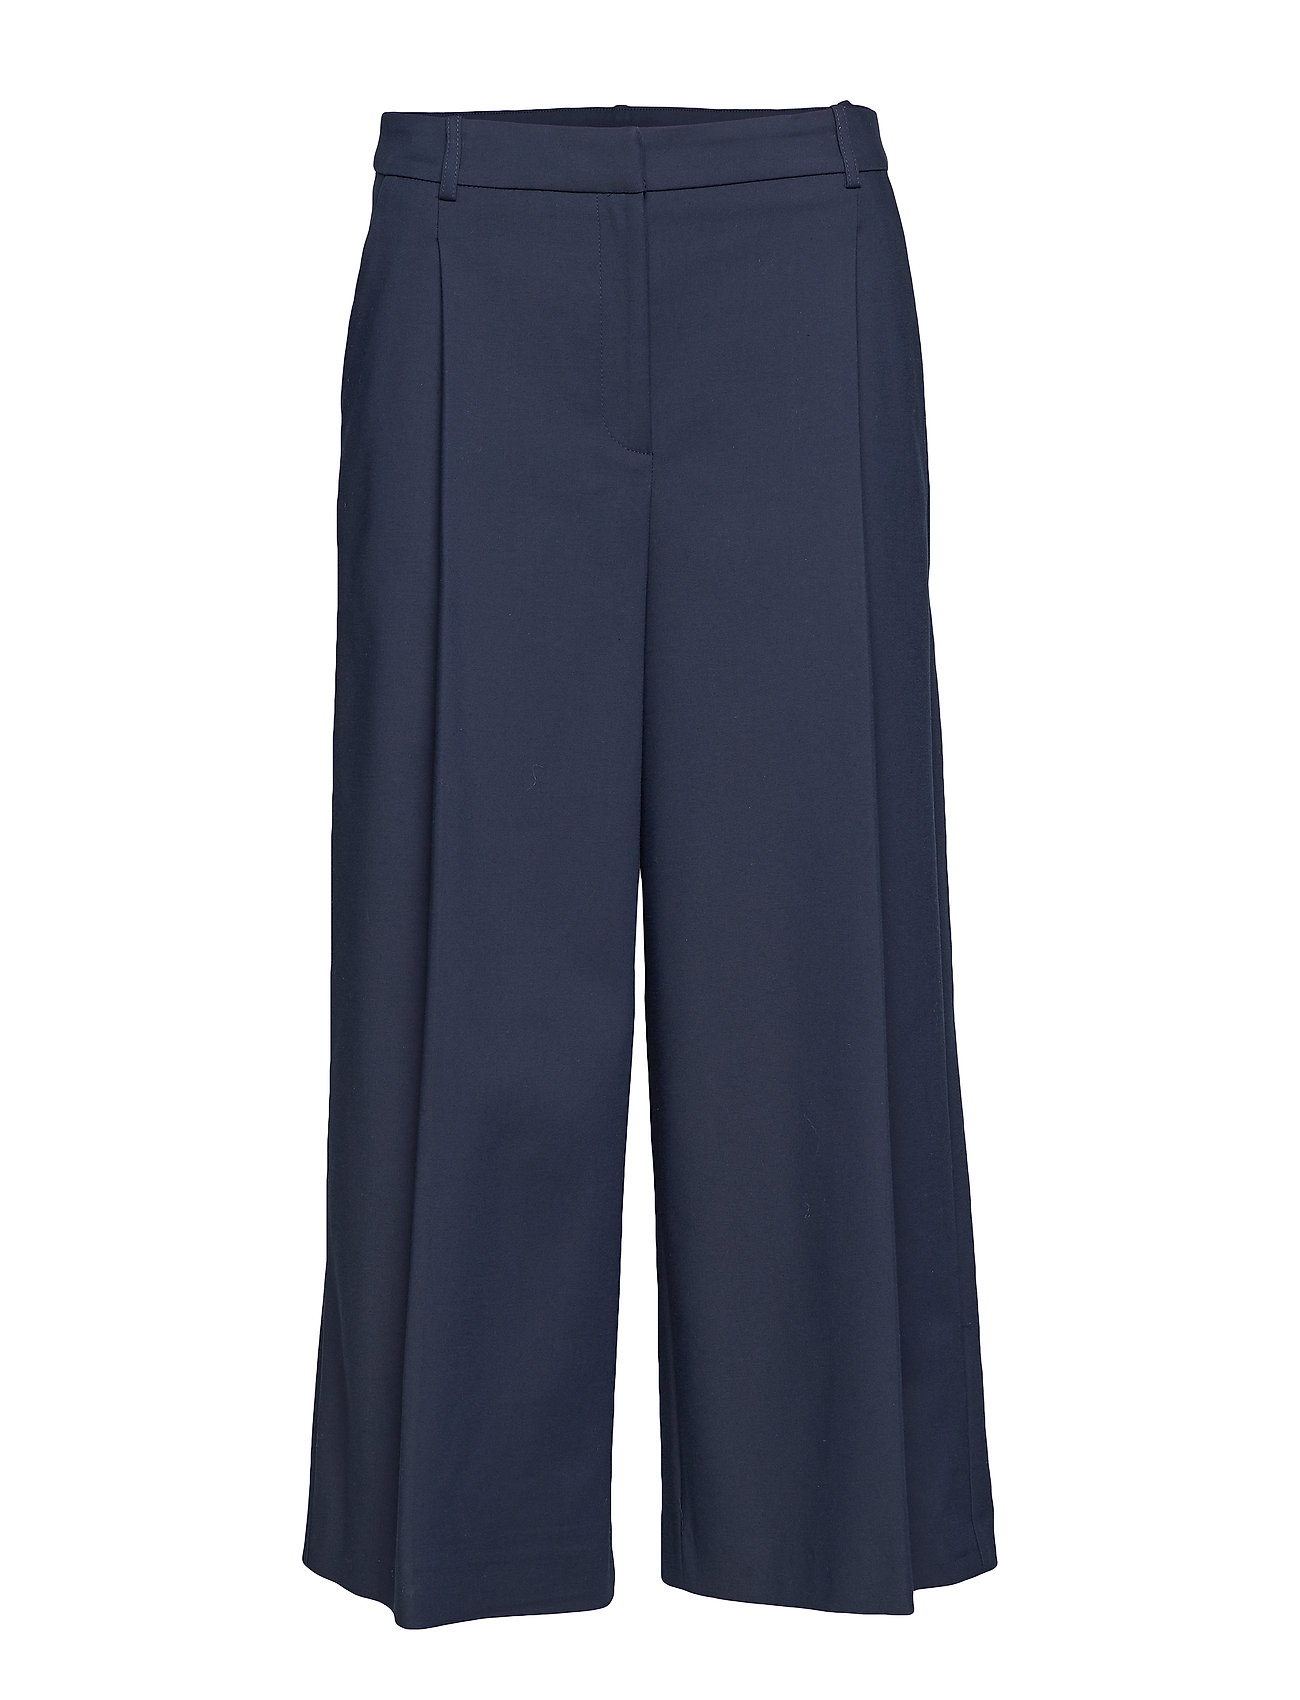 Image of Lucan Wide Trousers Vide Bukser Blå Andiata (3110520219)